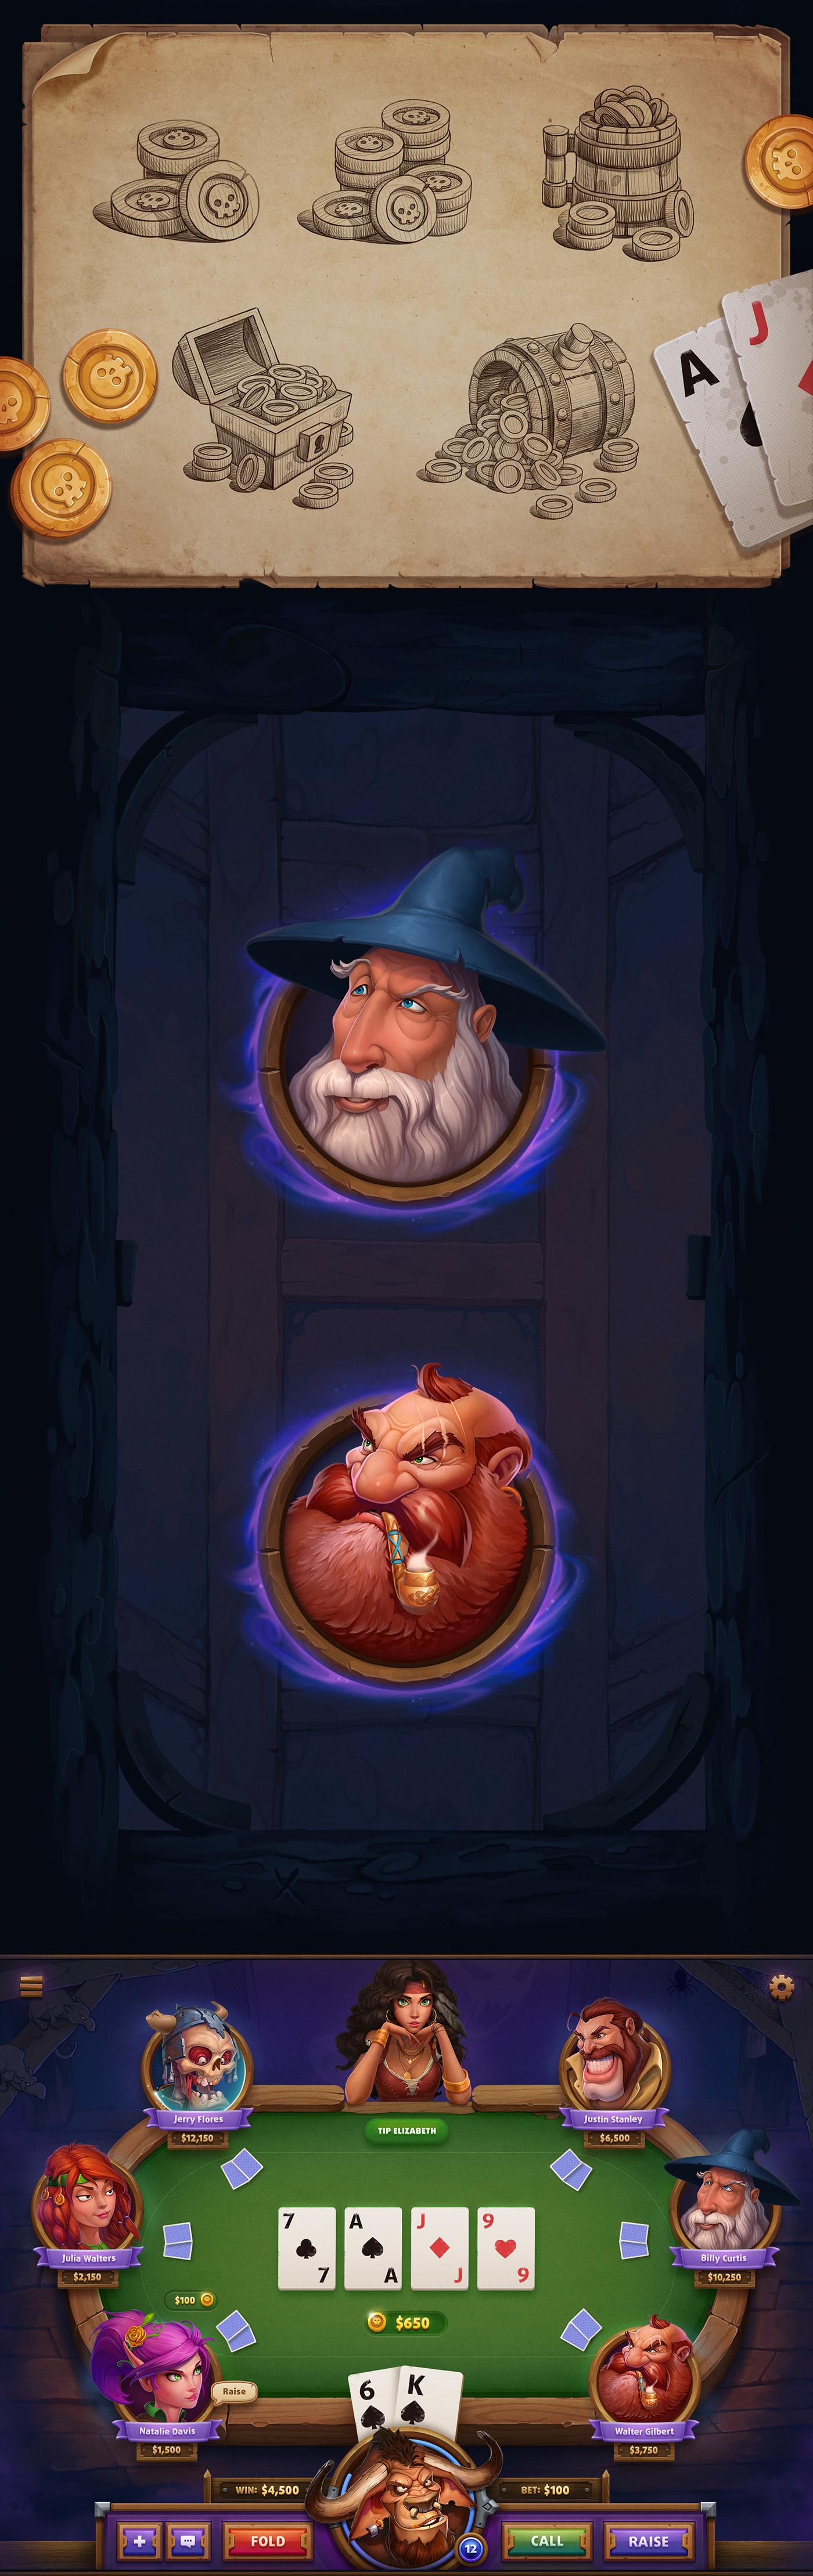 2 iOS Game Concepts